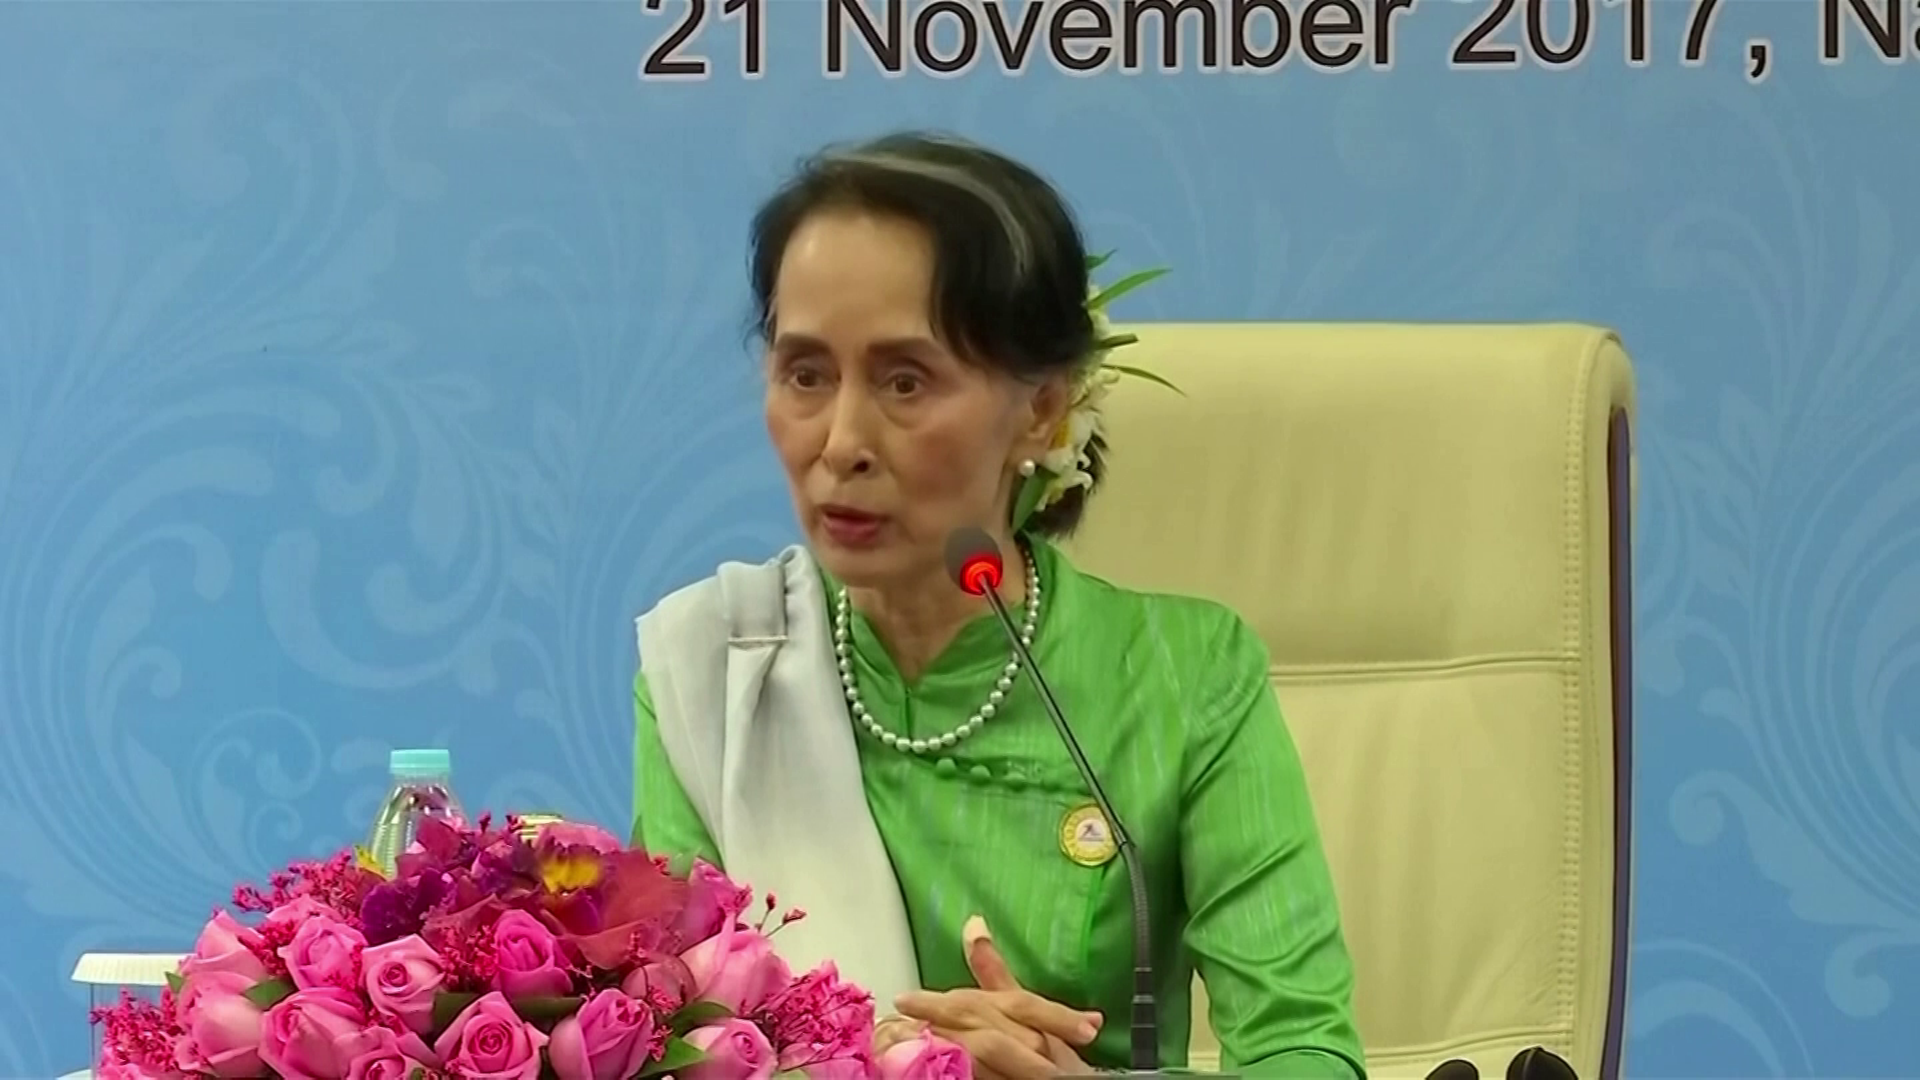 Aung San Suu Kyi permanece muito popular em Mianmar